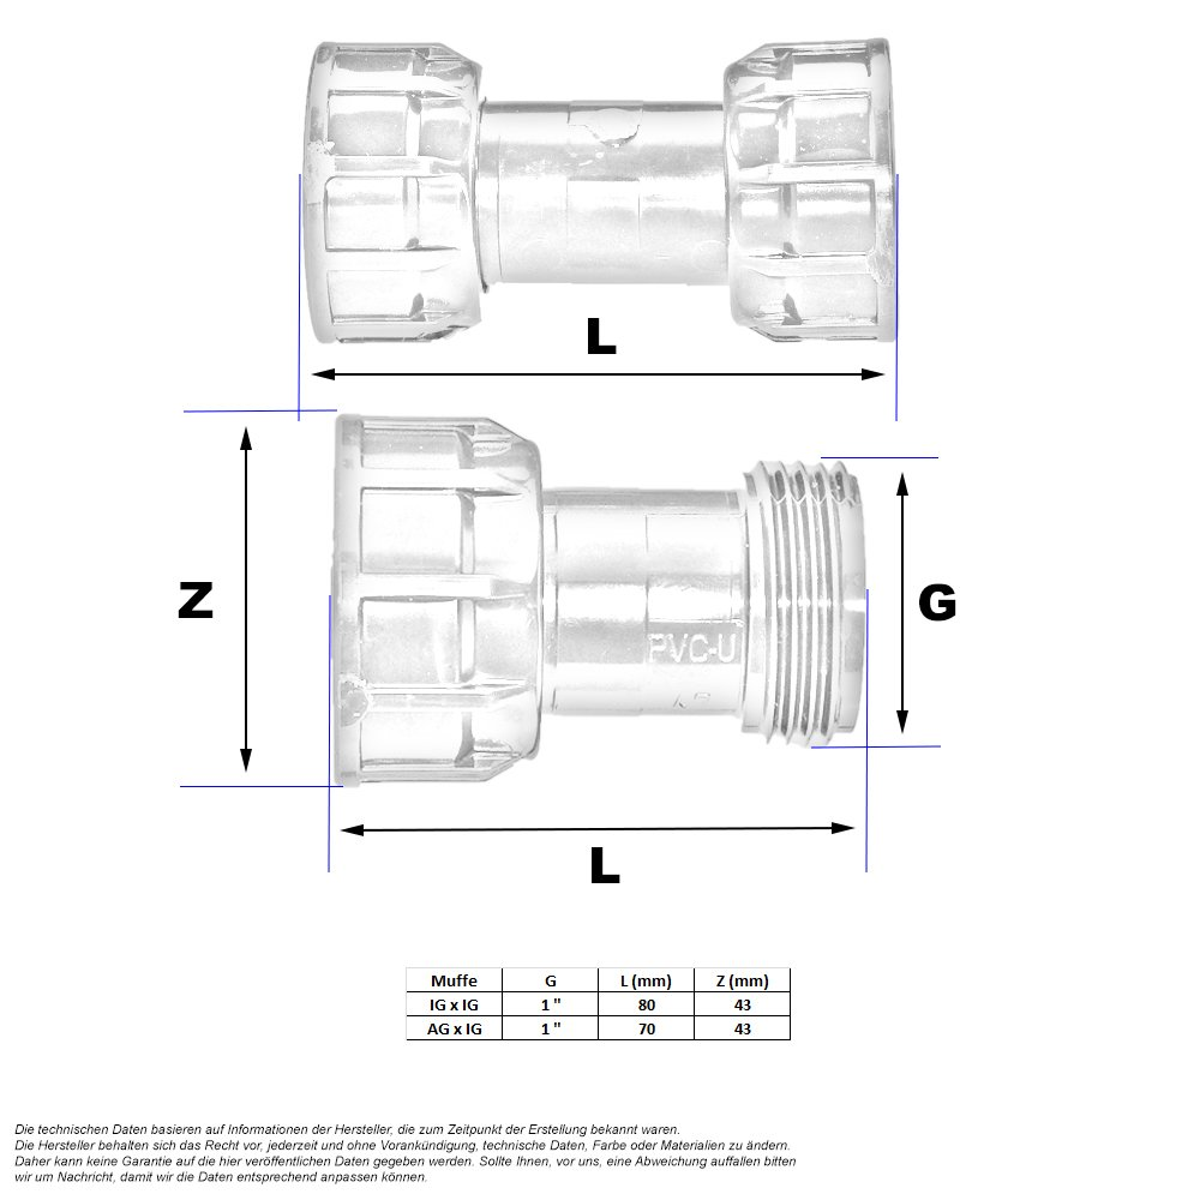 pvc pe rohr verteiler muffe 2 16. Black Bedroom Furniture Sets. Home Design Ideas